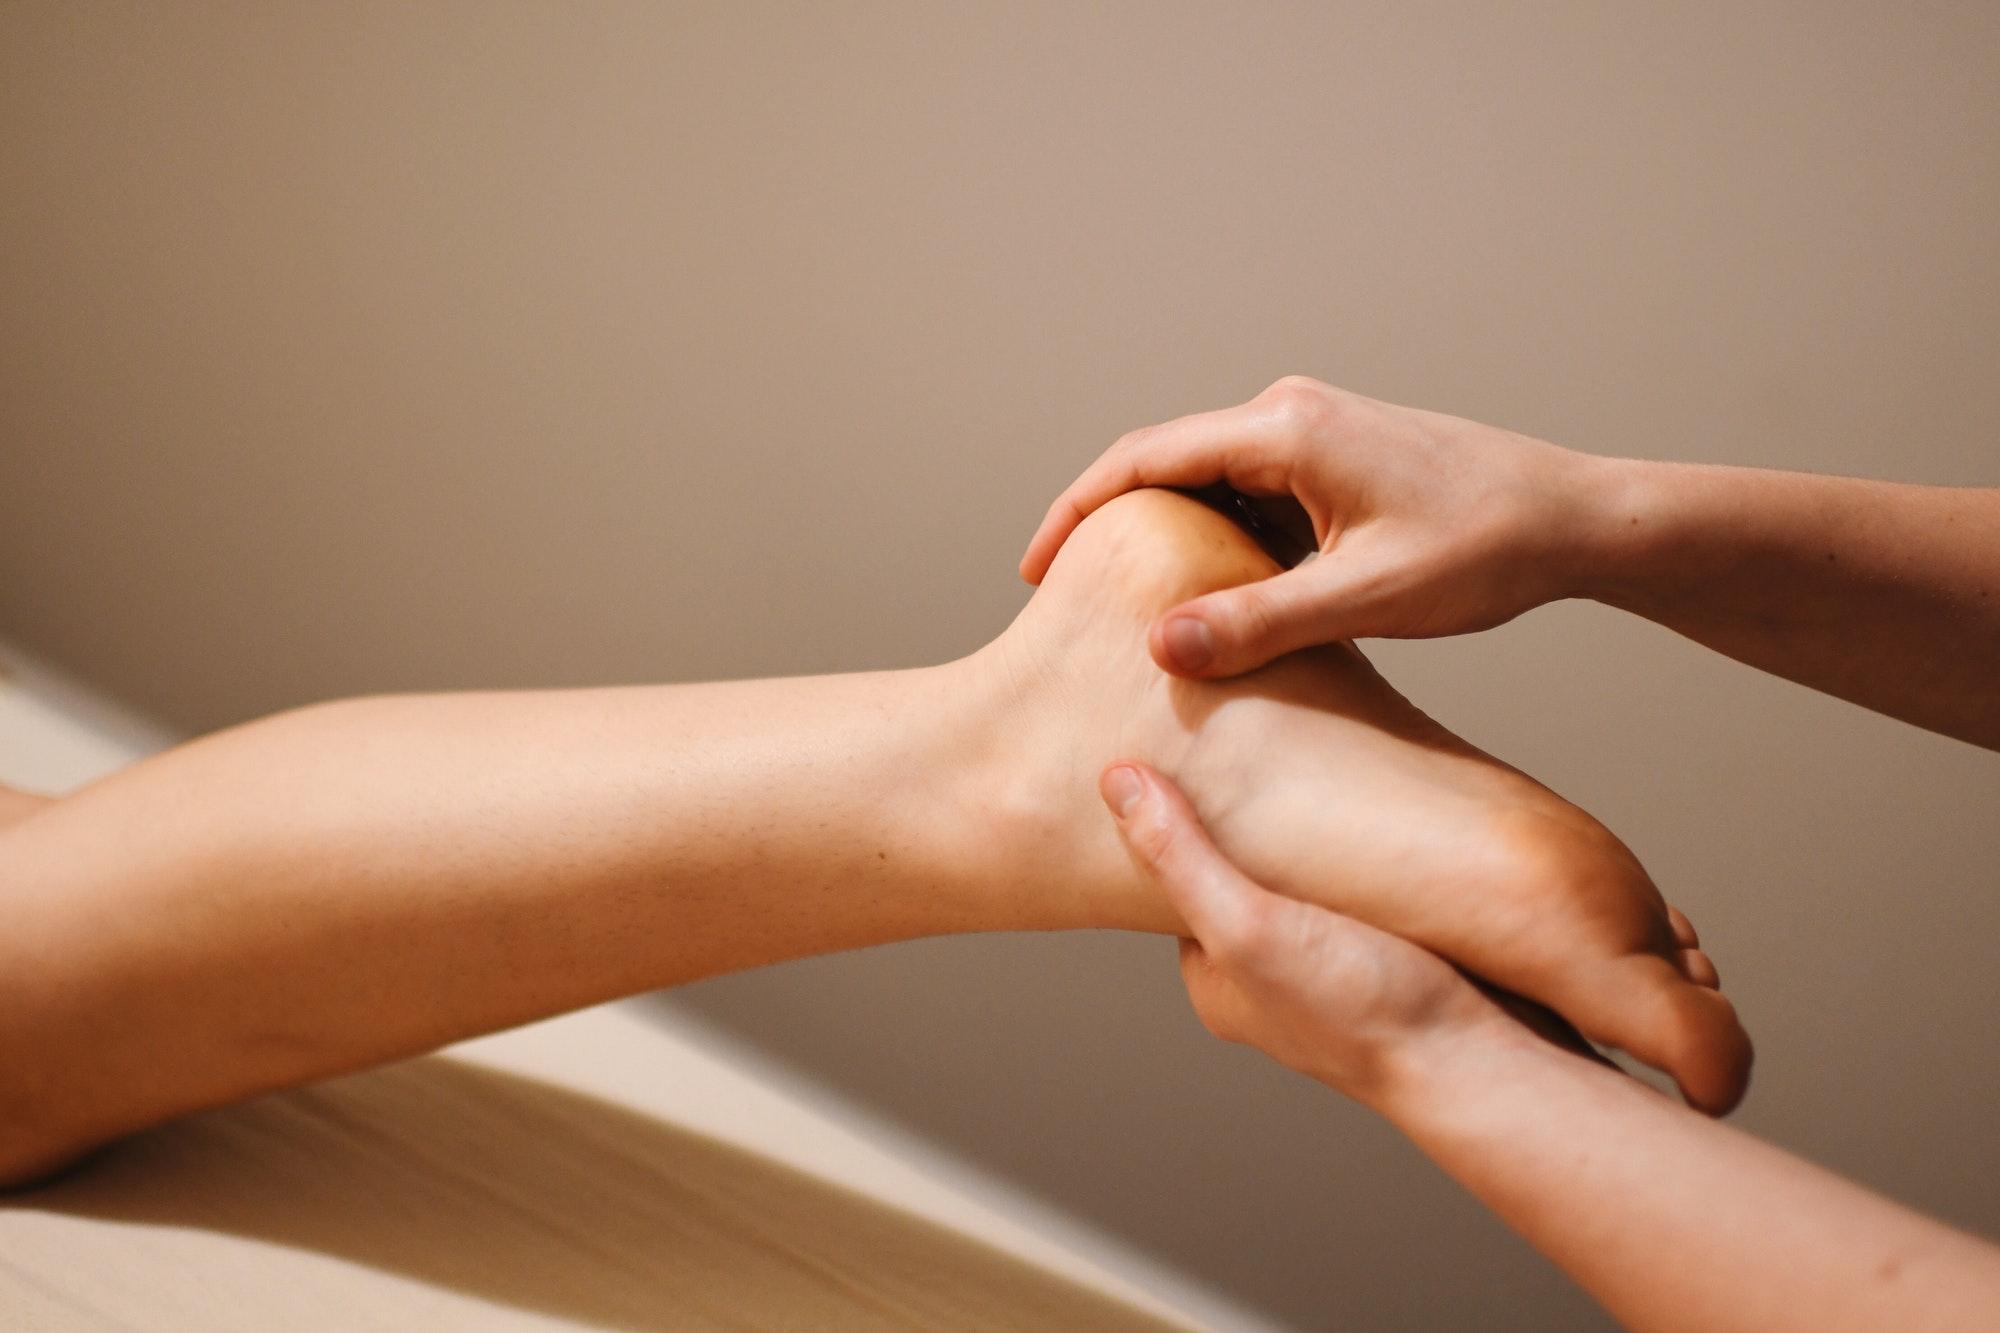 Someone massaging a girls foot